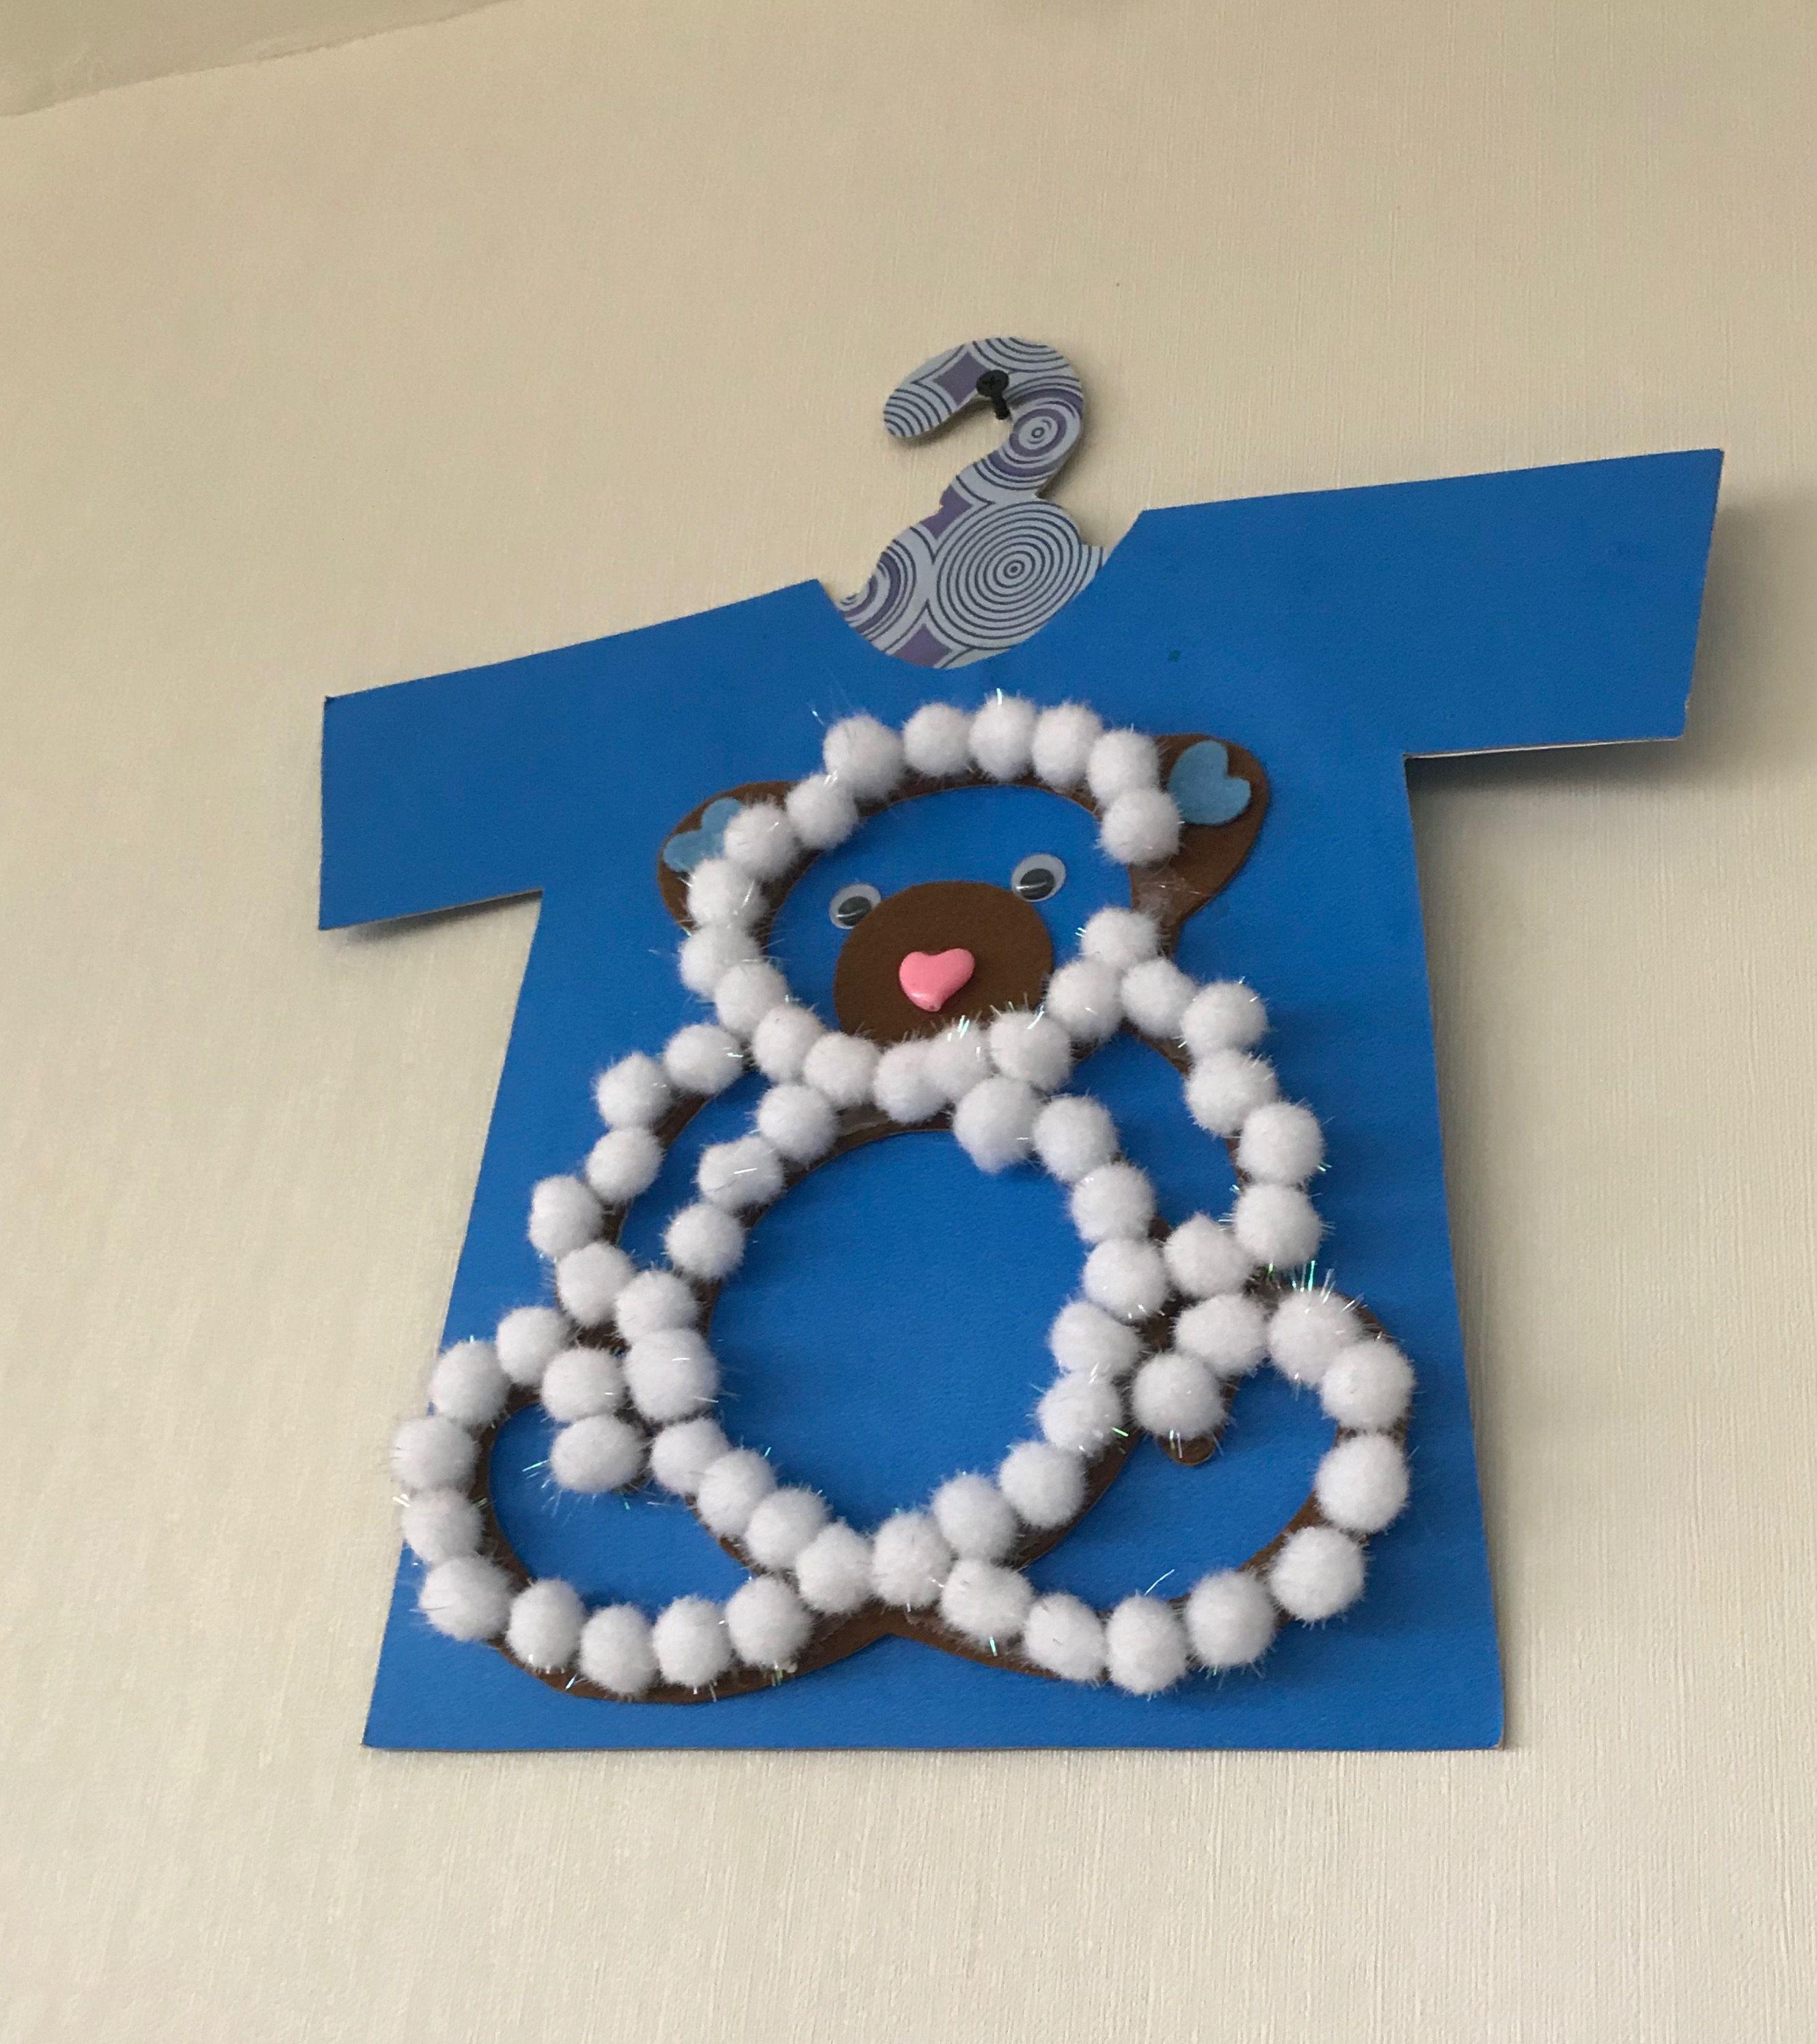 Pin Oleh Kanchana Di Crafts For Kids